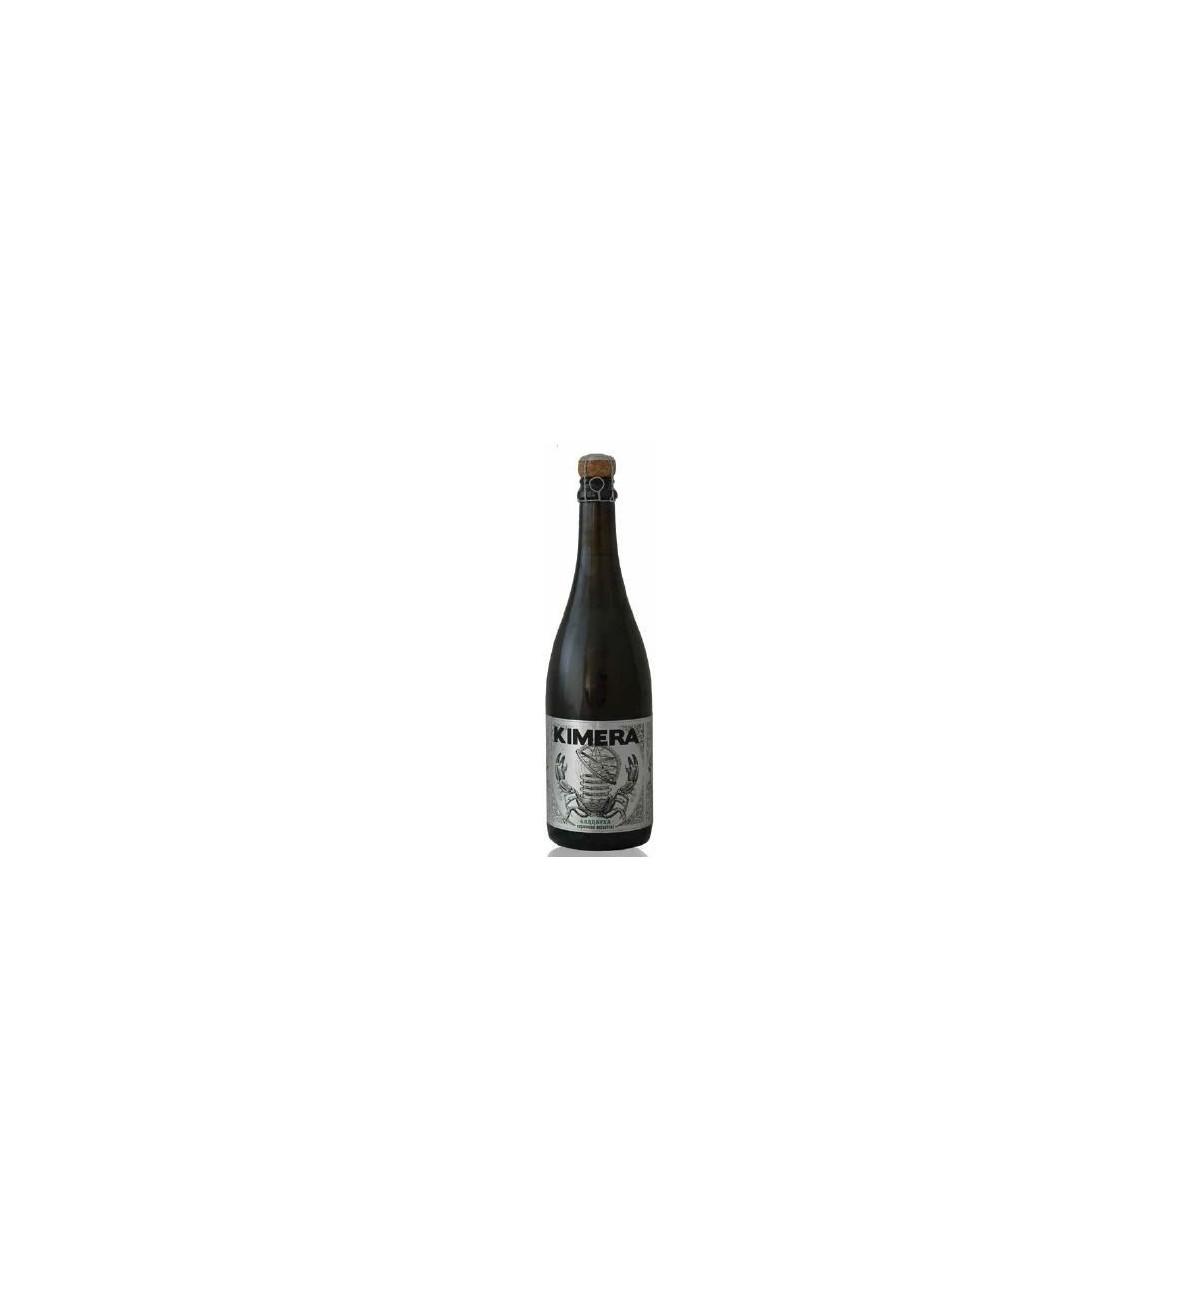 Kimera Ancestral Garnacha Blanca - LMT wines - Garnatxa, Navarra